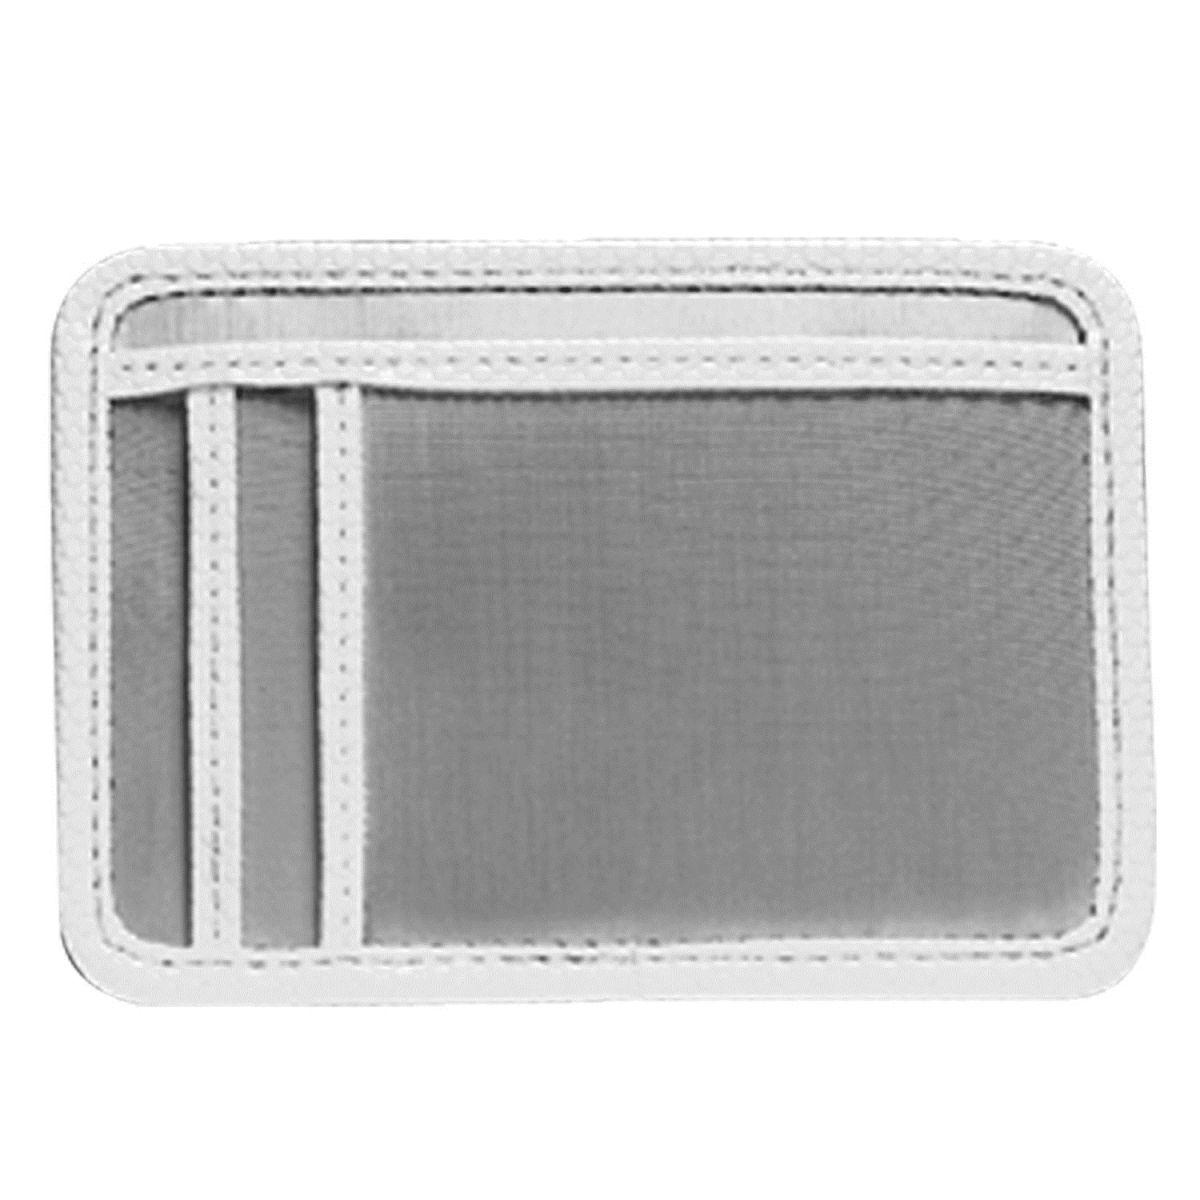 Stewart/Stand Stainless Steel Minimal Wallet - Silver/White